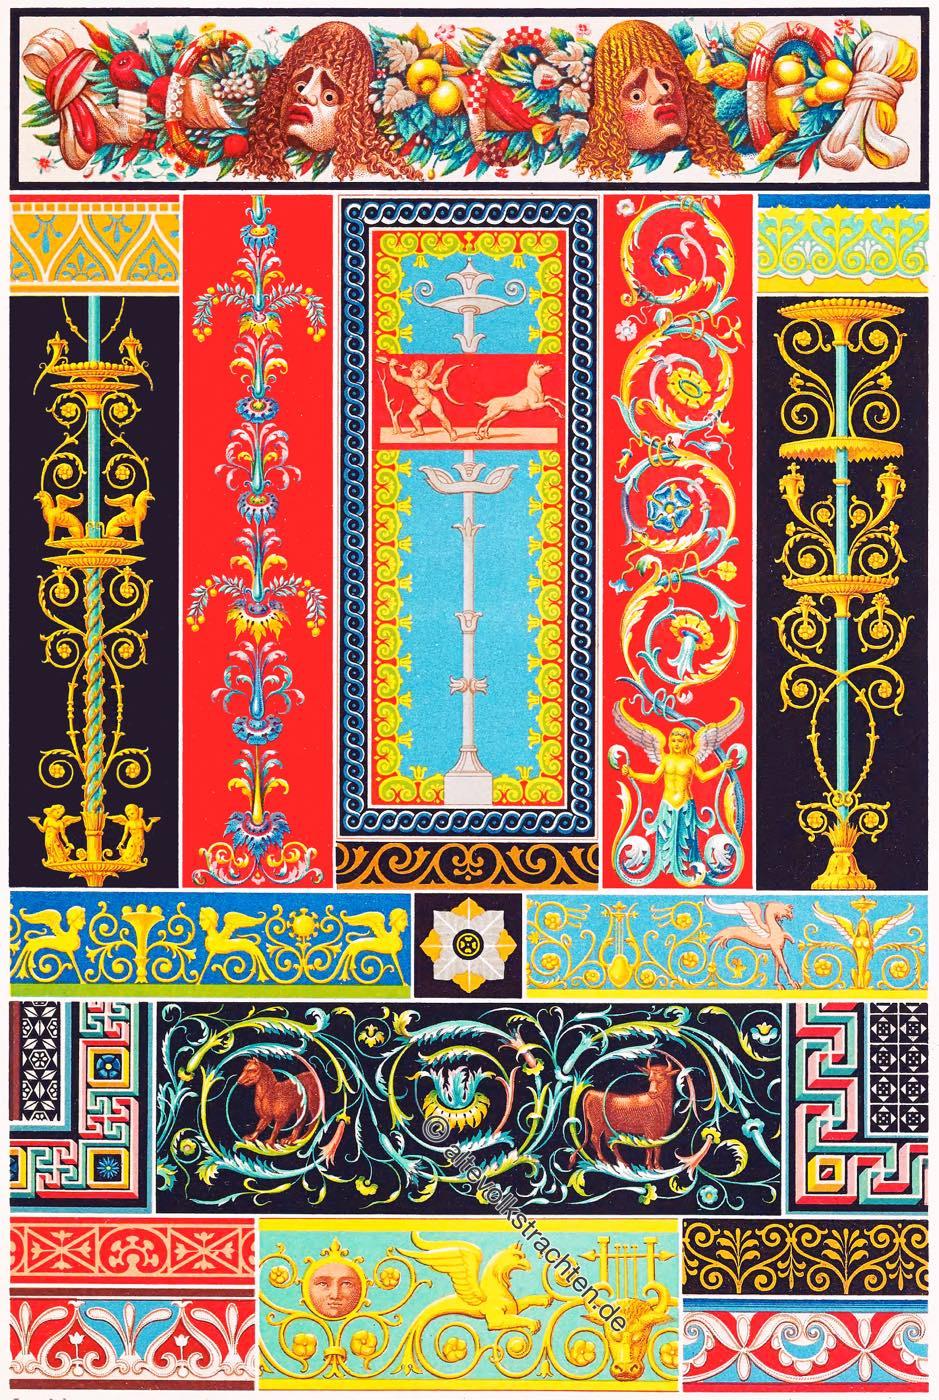 Pompeji, Herculaneum, Griechisch-Römische Kunst, Ornamente, Mosaiken, Flachreliefs